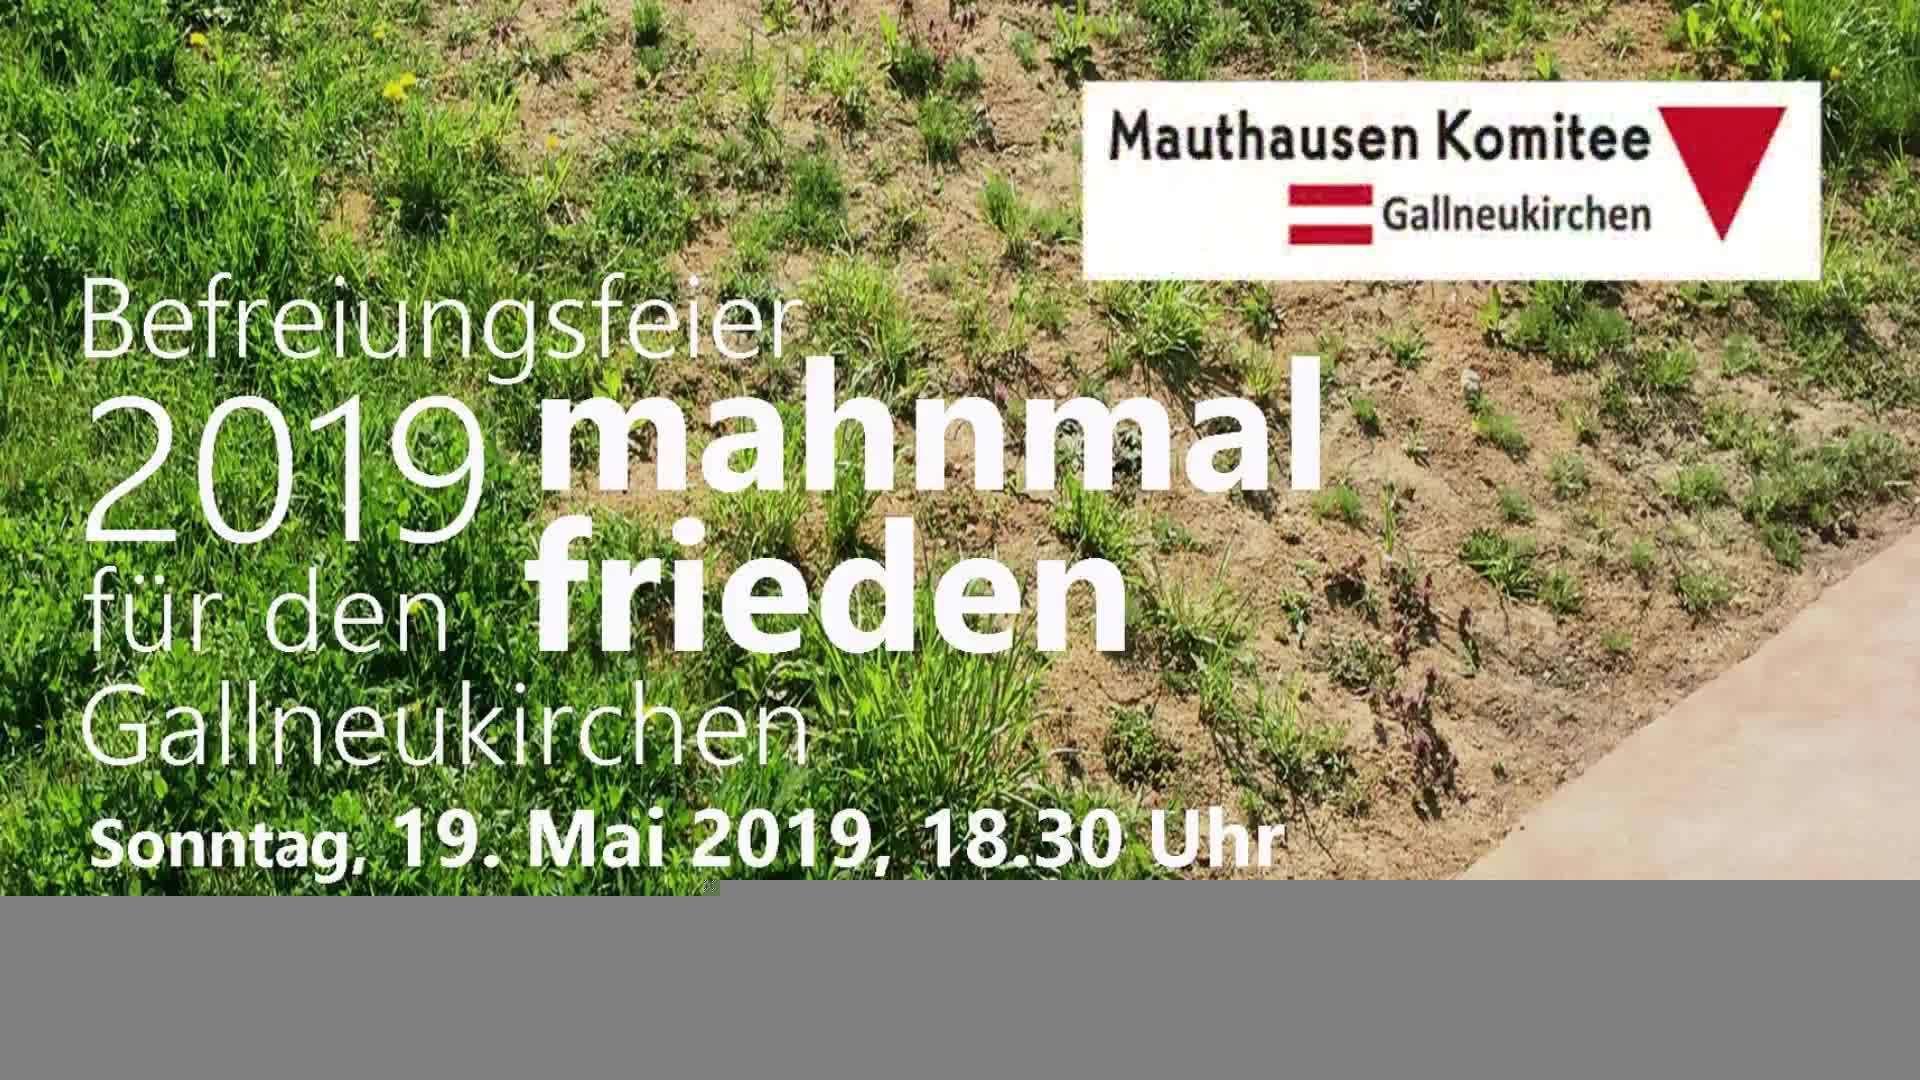 Mahnmalfeier 2019 in Gallneukirchen